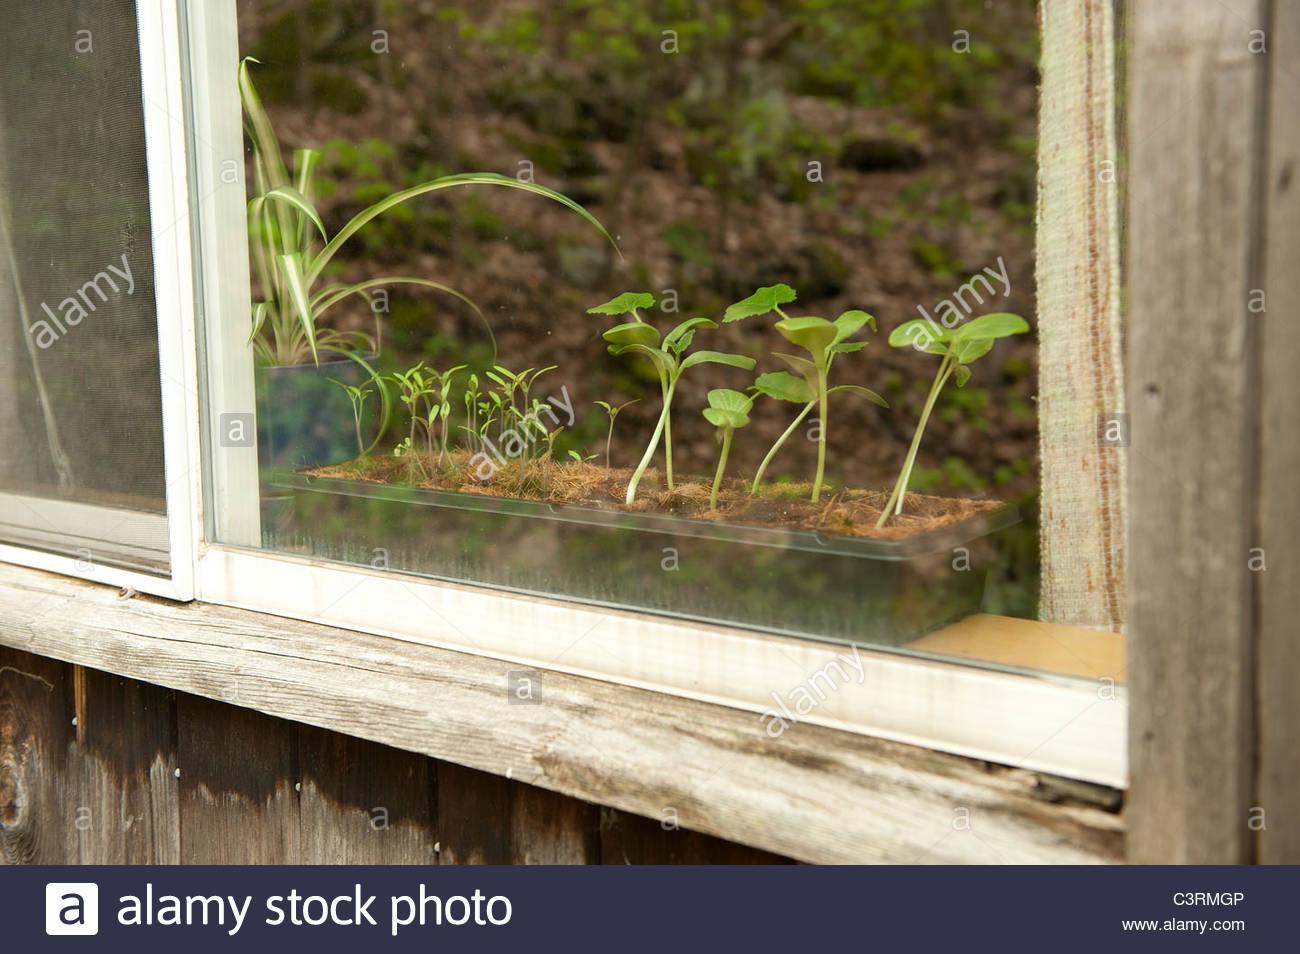 Vegetable seedlings windowsill plants propogation - Stock Image